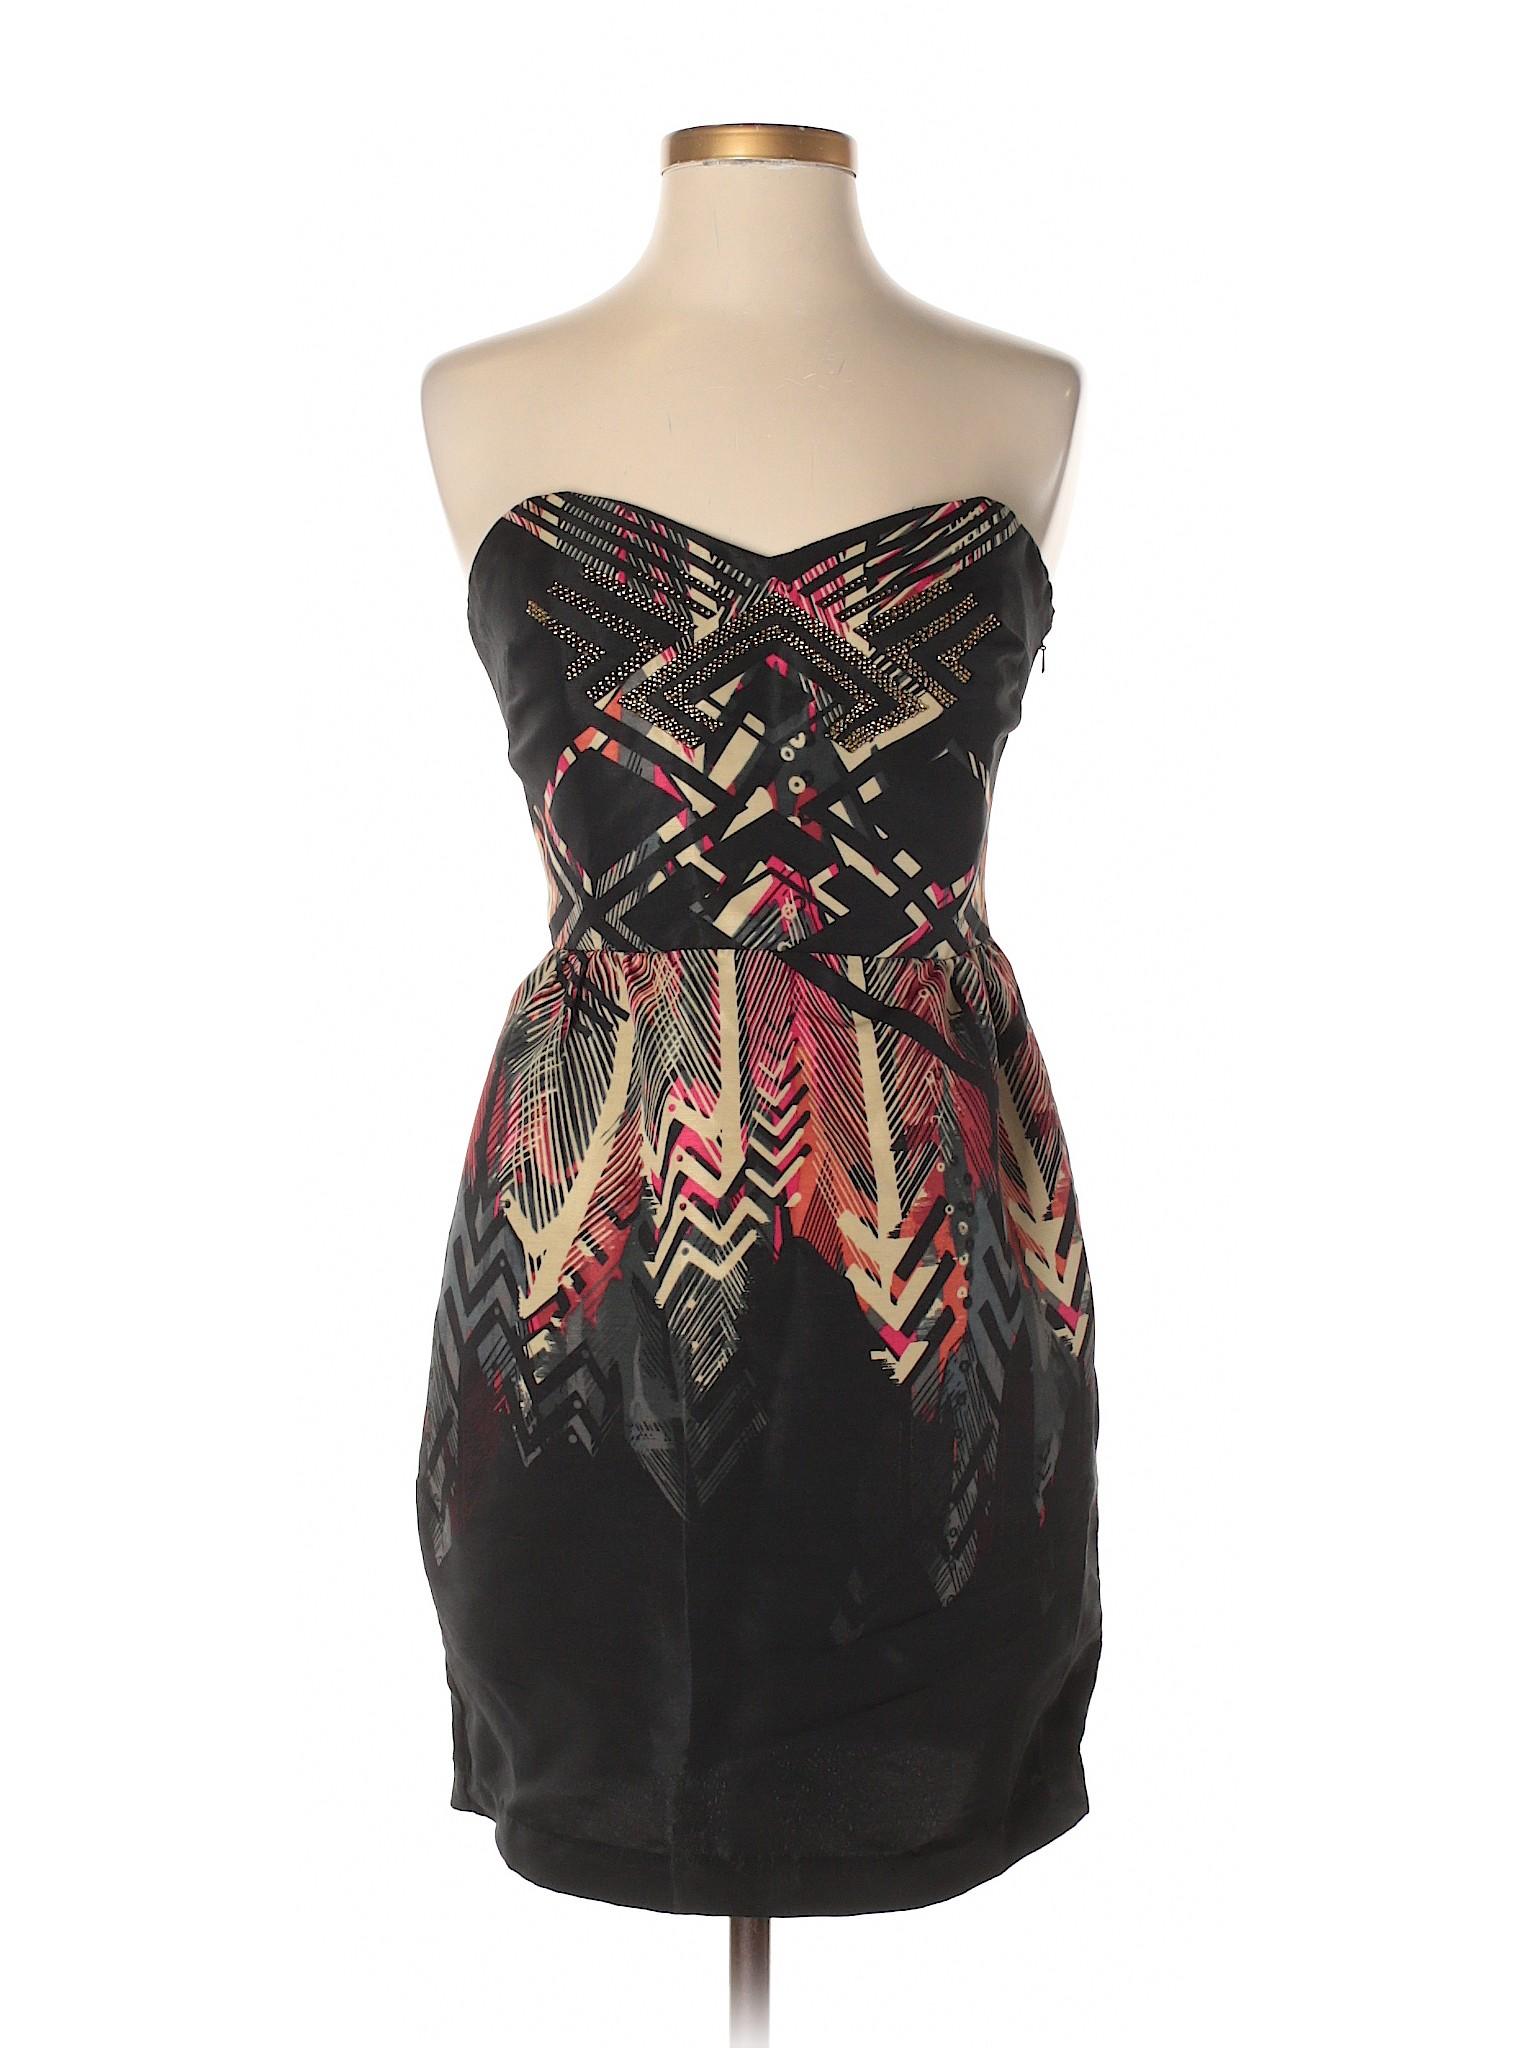 Selling Ecote Casual Selling Ecote Ecote Dress Selling Casual Dress Dress Selling Dress Selling Ecote Casual Ecote Casual 10Rq1Ar